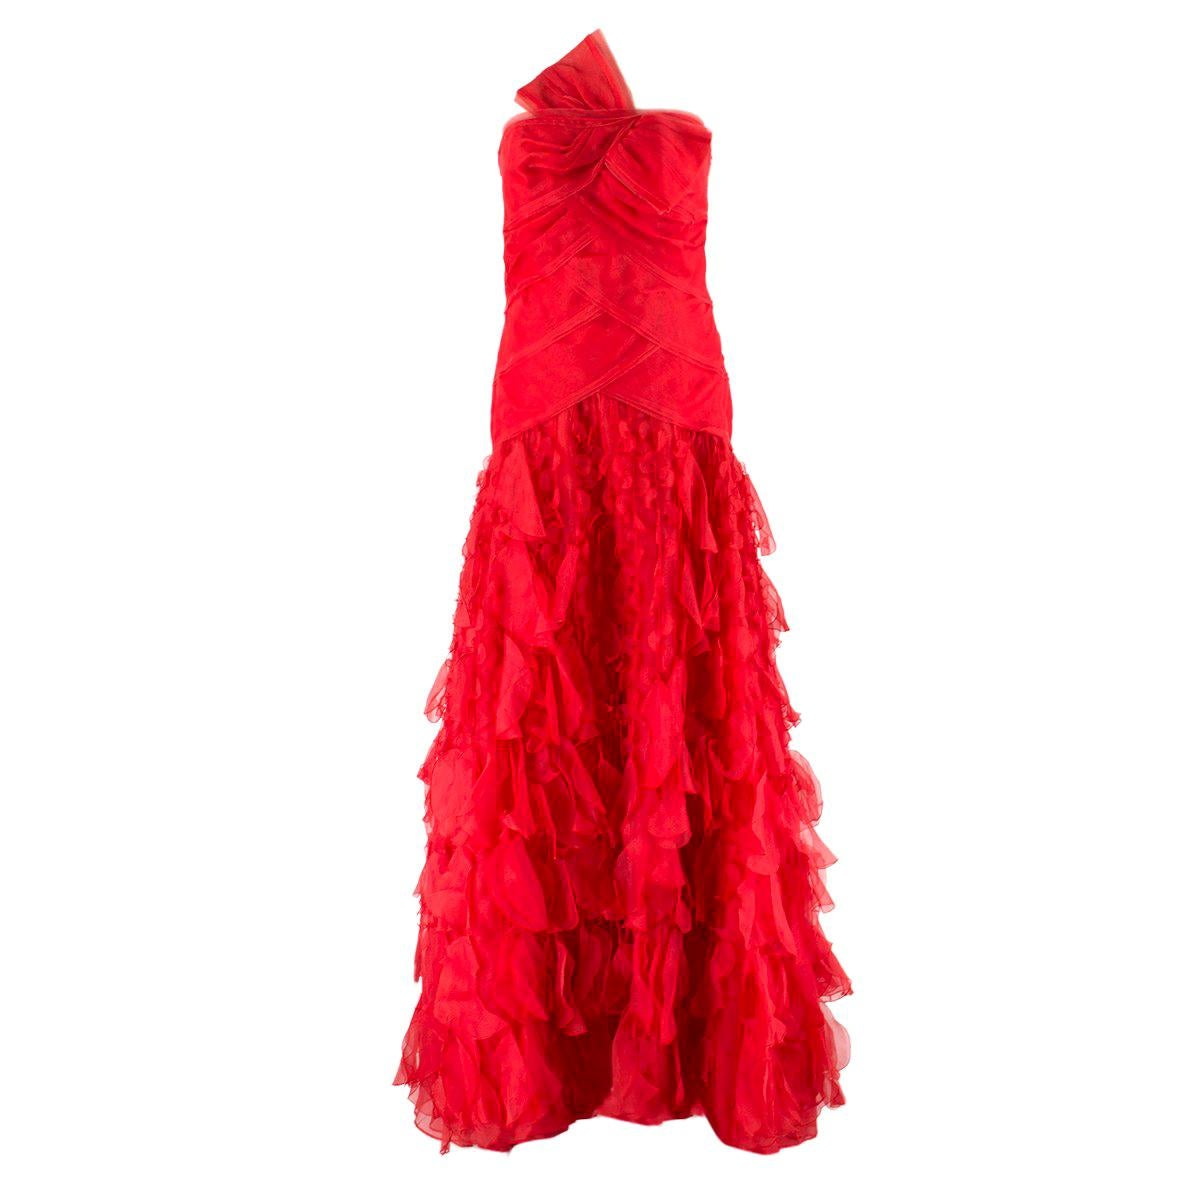 7be828974db Red Organza Dress – Fashion dresses